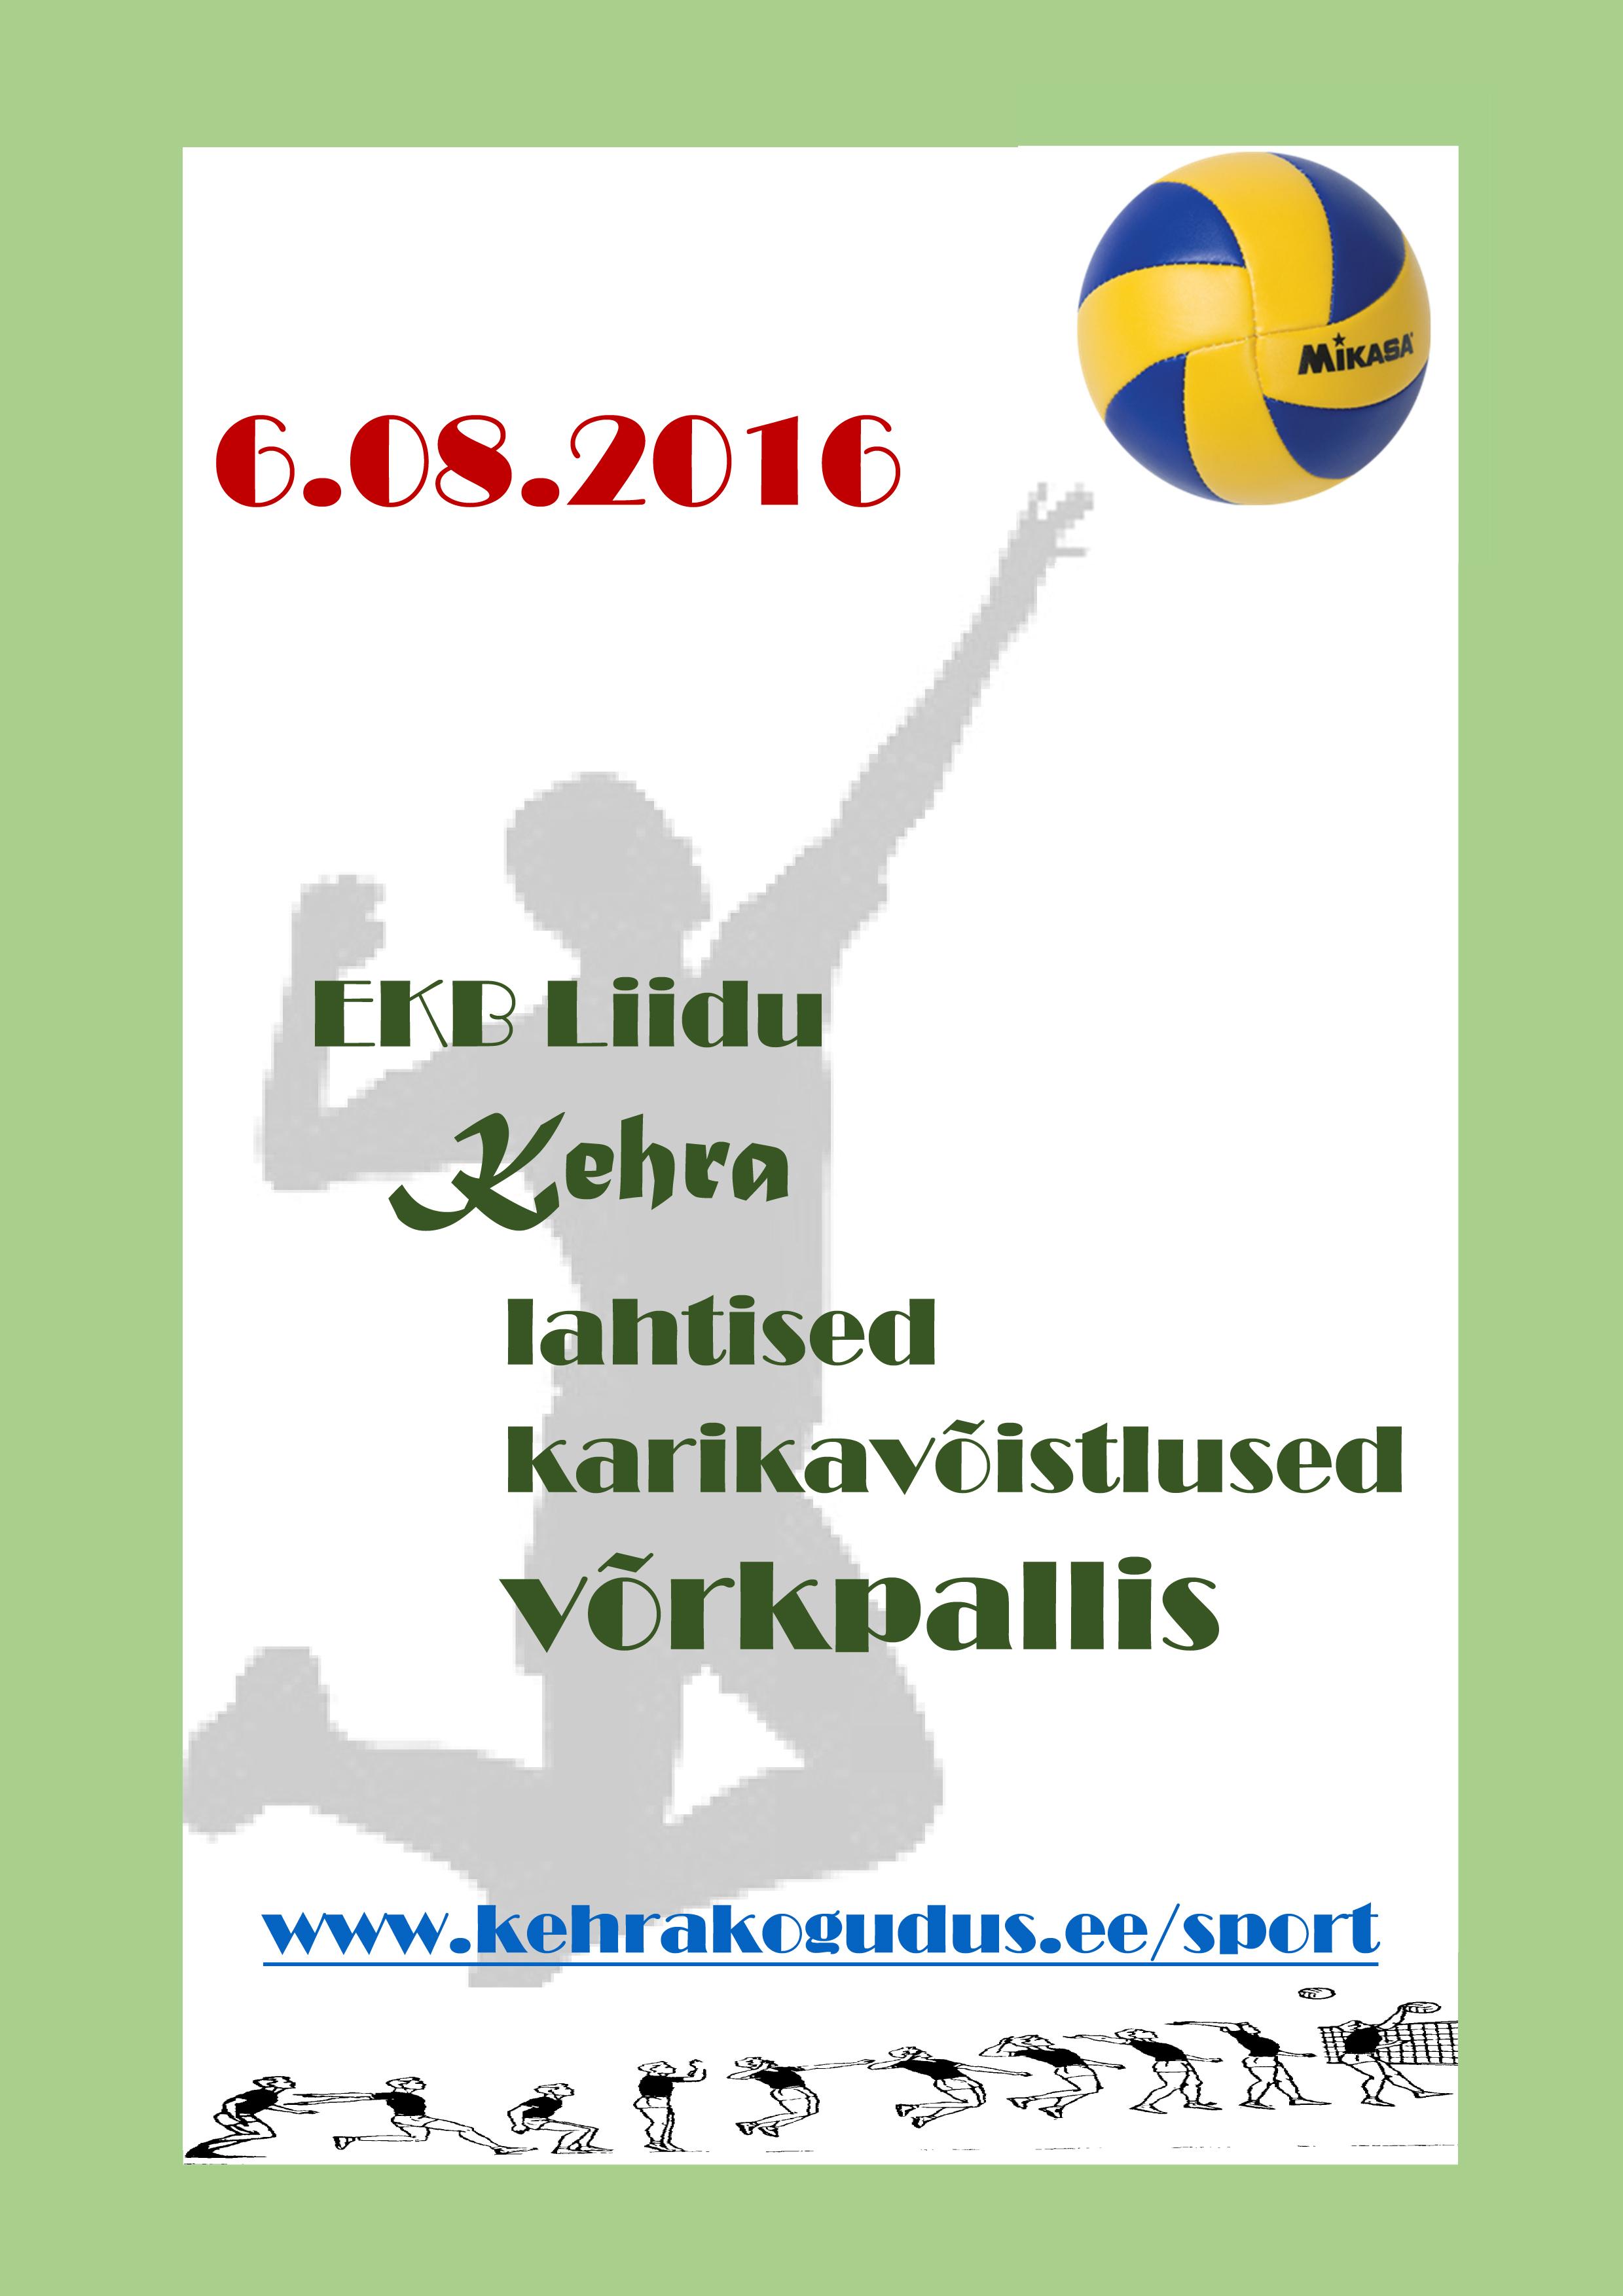 (Microsoft Word - V365rkpall2016Plakat_2)